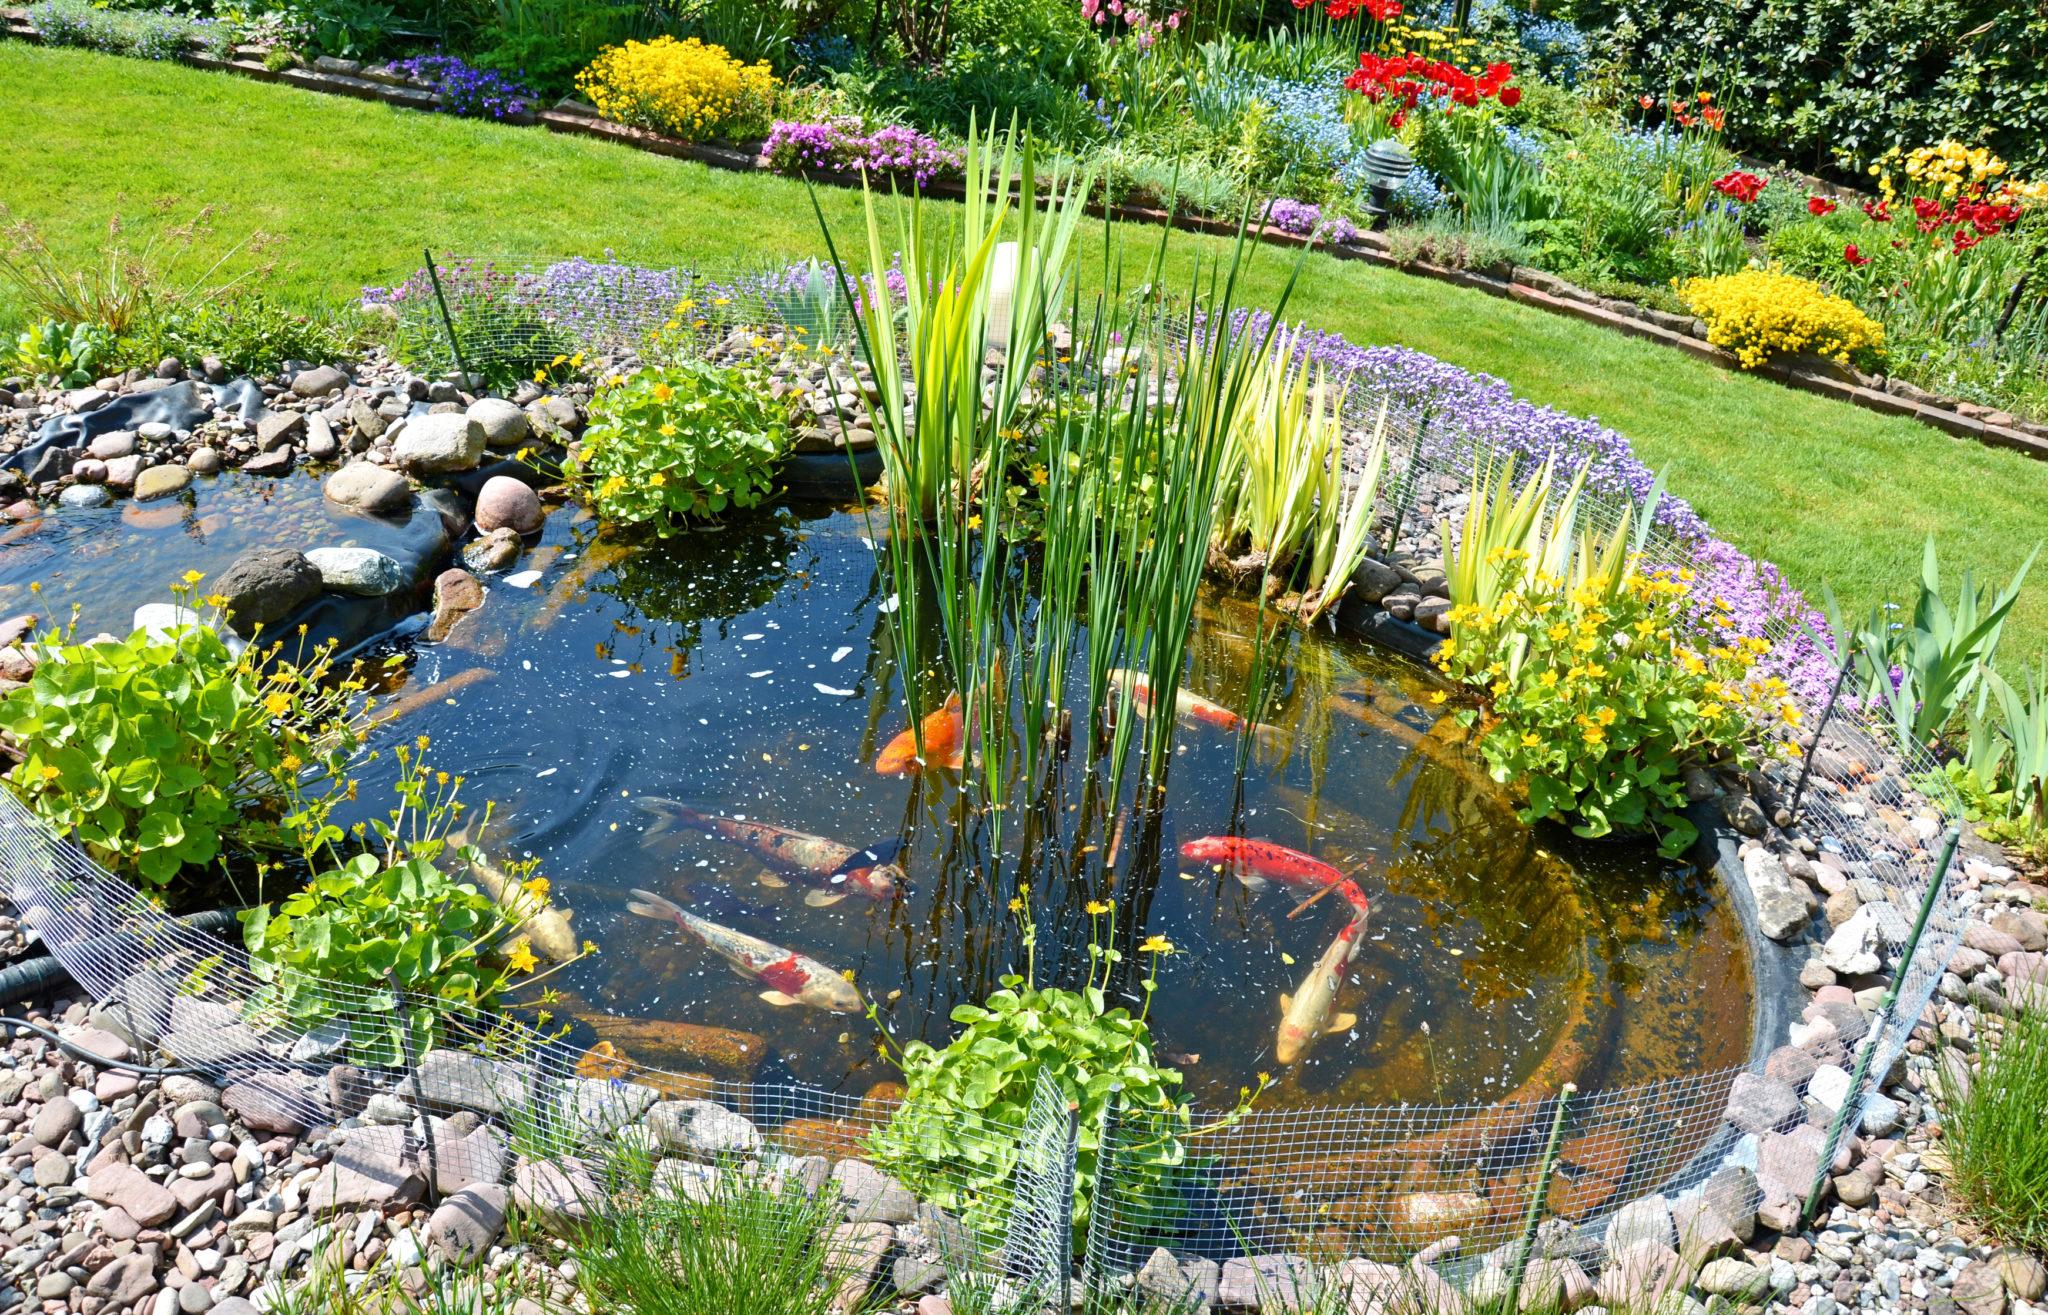 Construire Son Bassin De Jardin construire un bassin de jardin pour poissons - magazine zooplus